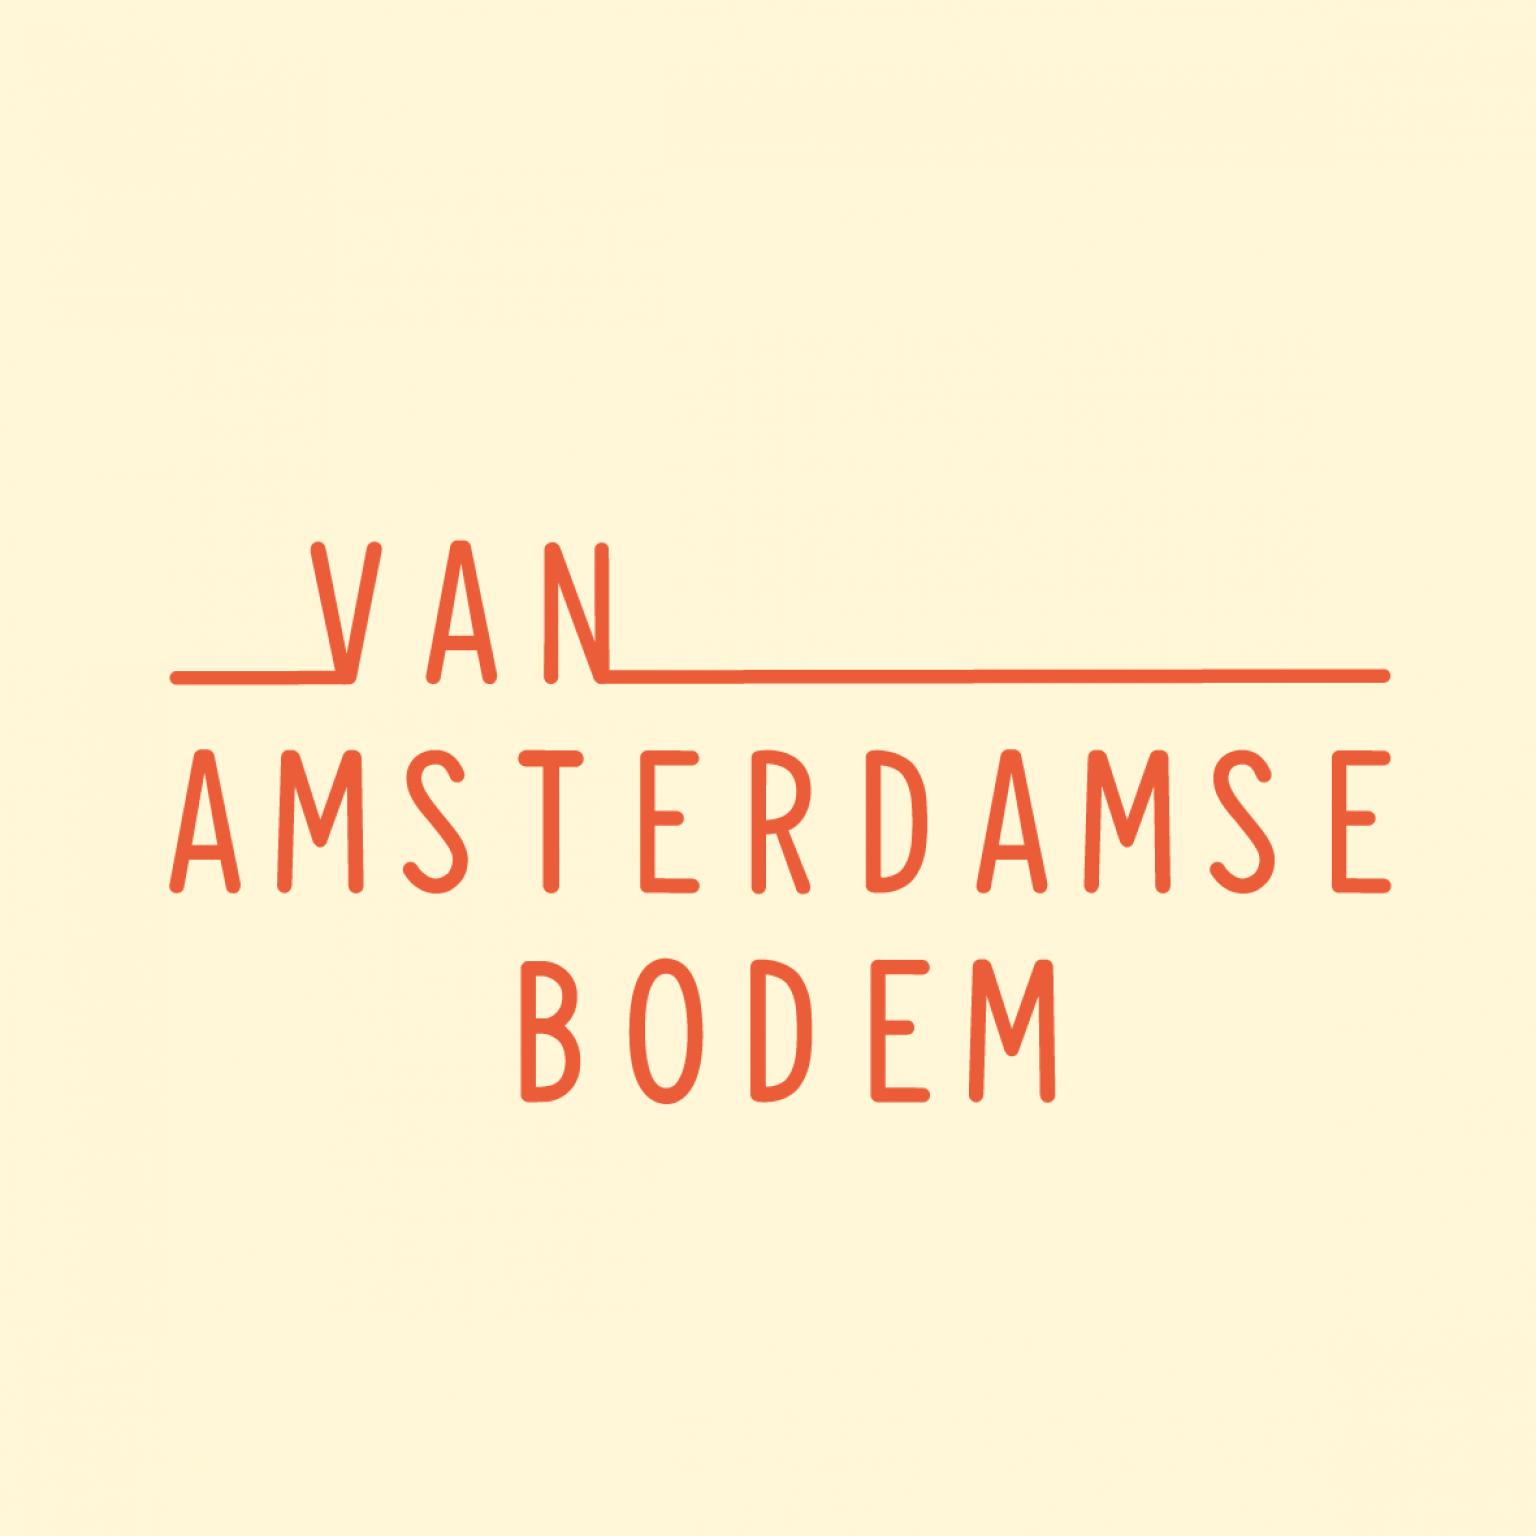 achtergrond_van-amsterdamse-bodem-rood-01-768x768@2x.png